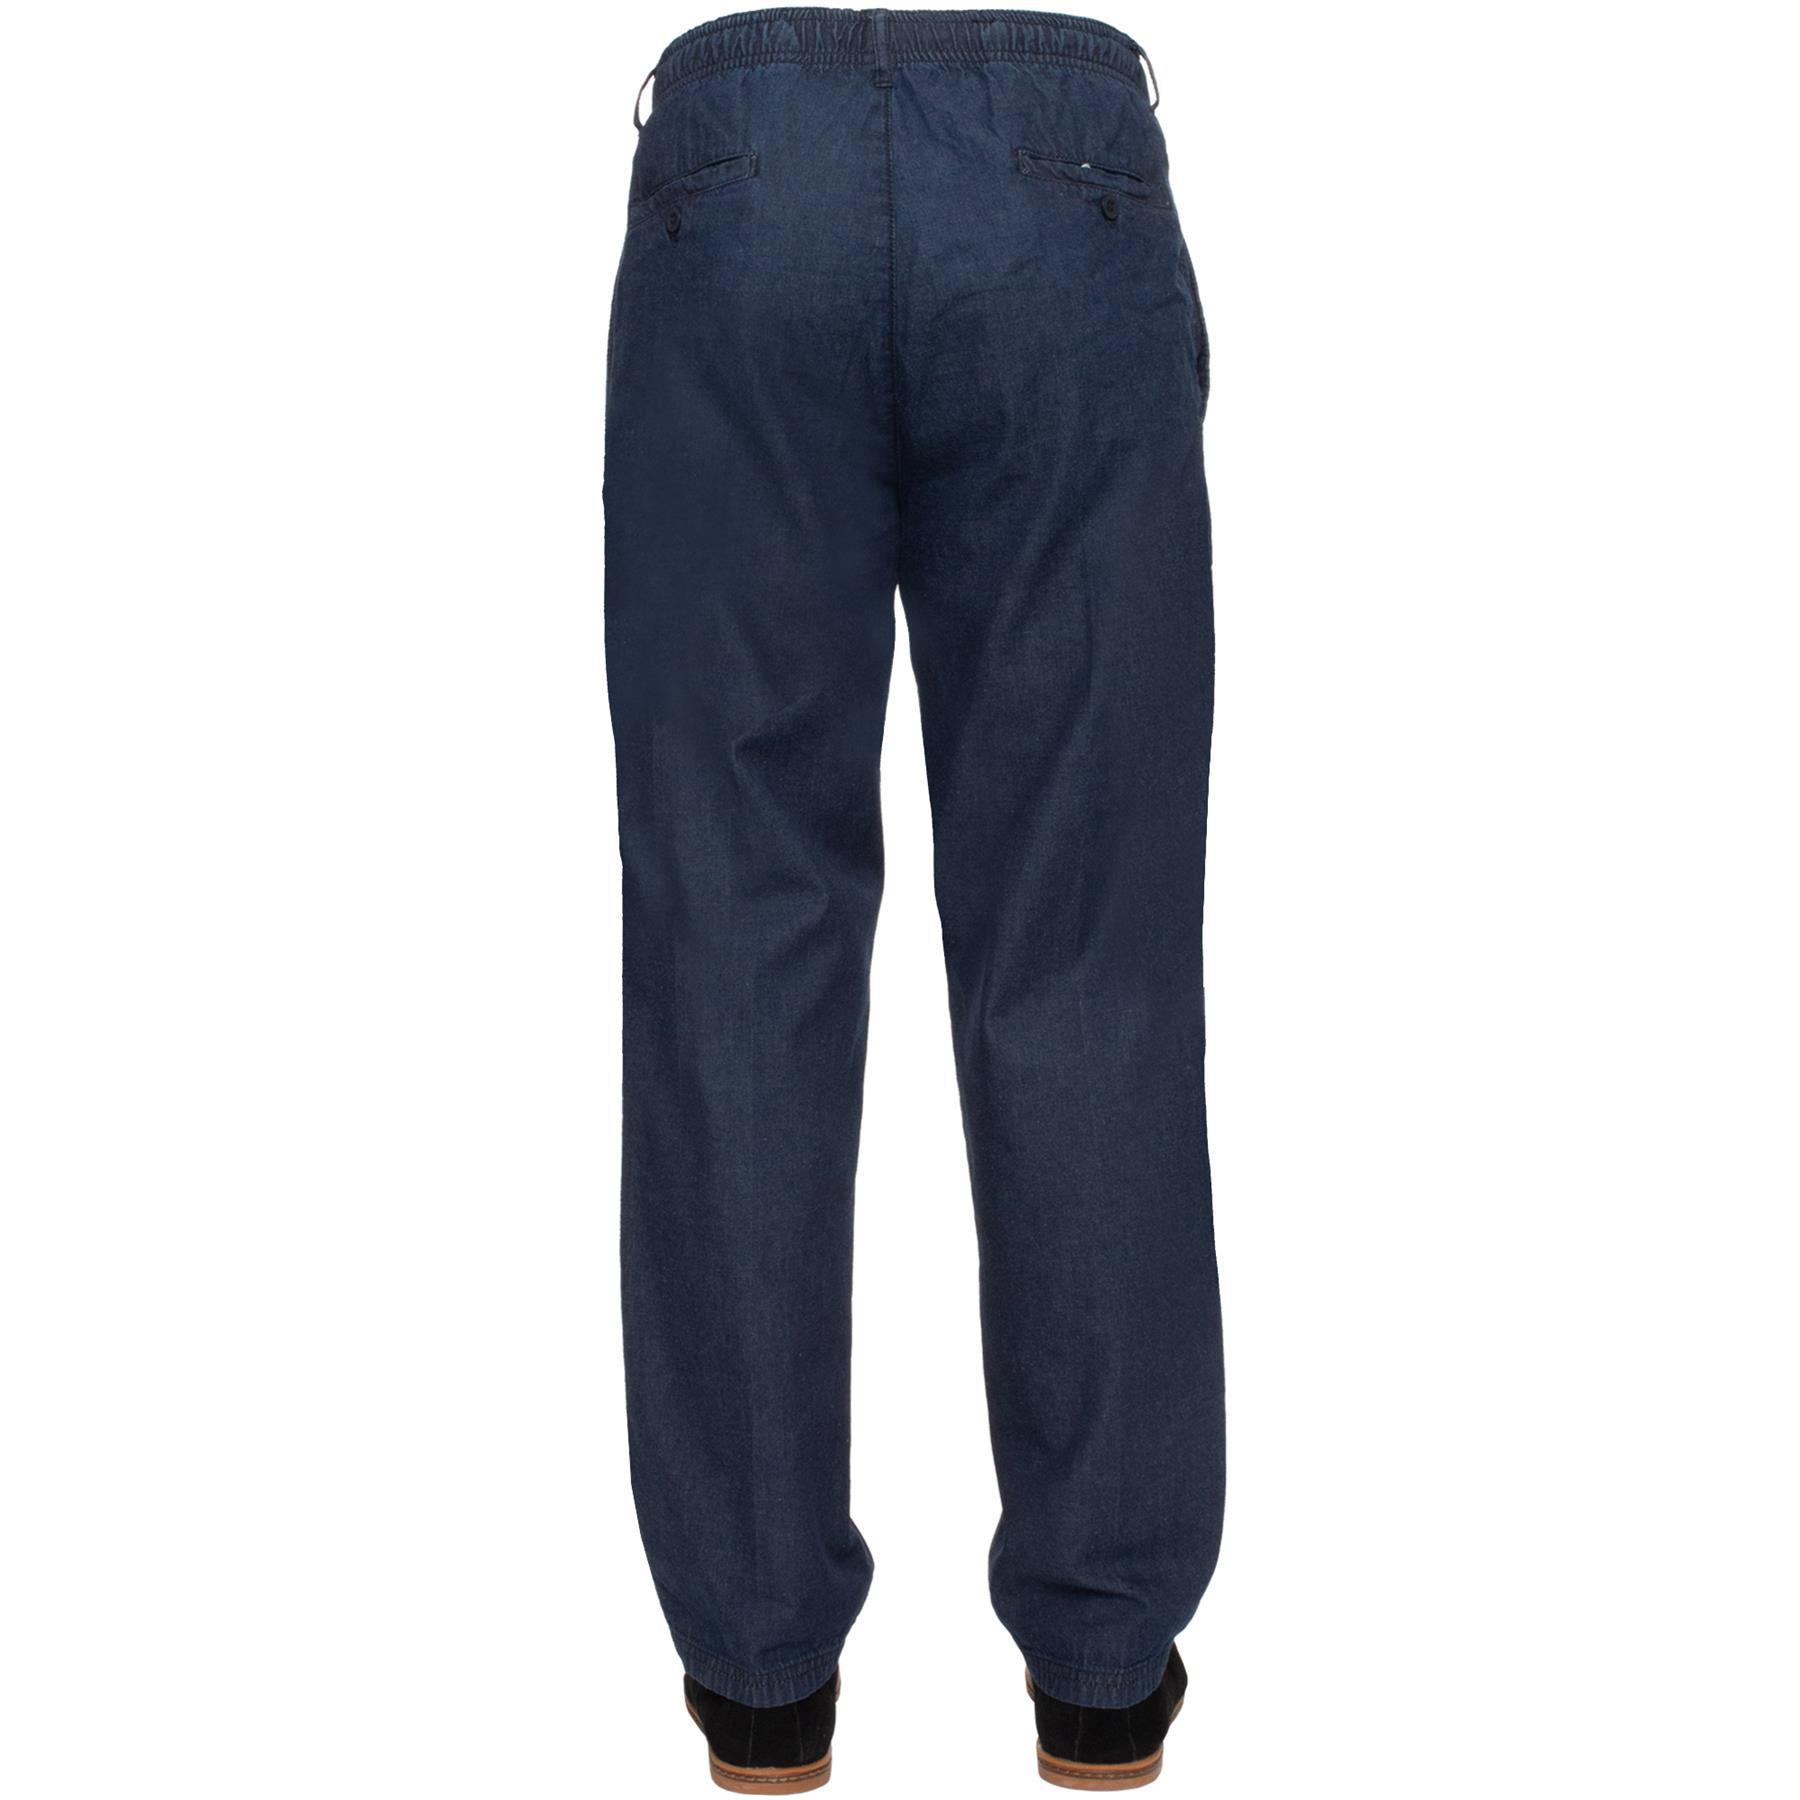 Para-Hombres-Pantalones-De-Rugby-Kruze-cintura-elastica-con-cordon-pantalones-REGULAR-King-Tamanos miniatura 19